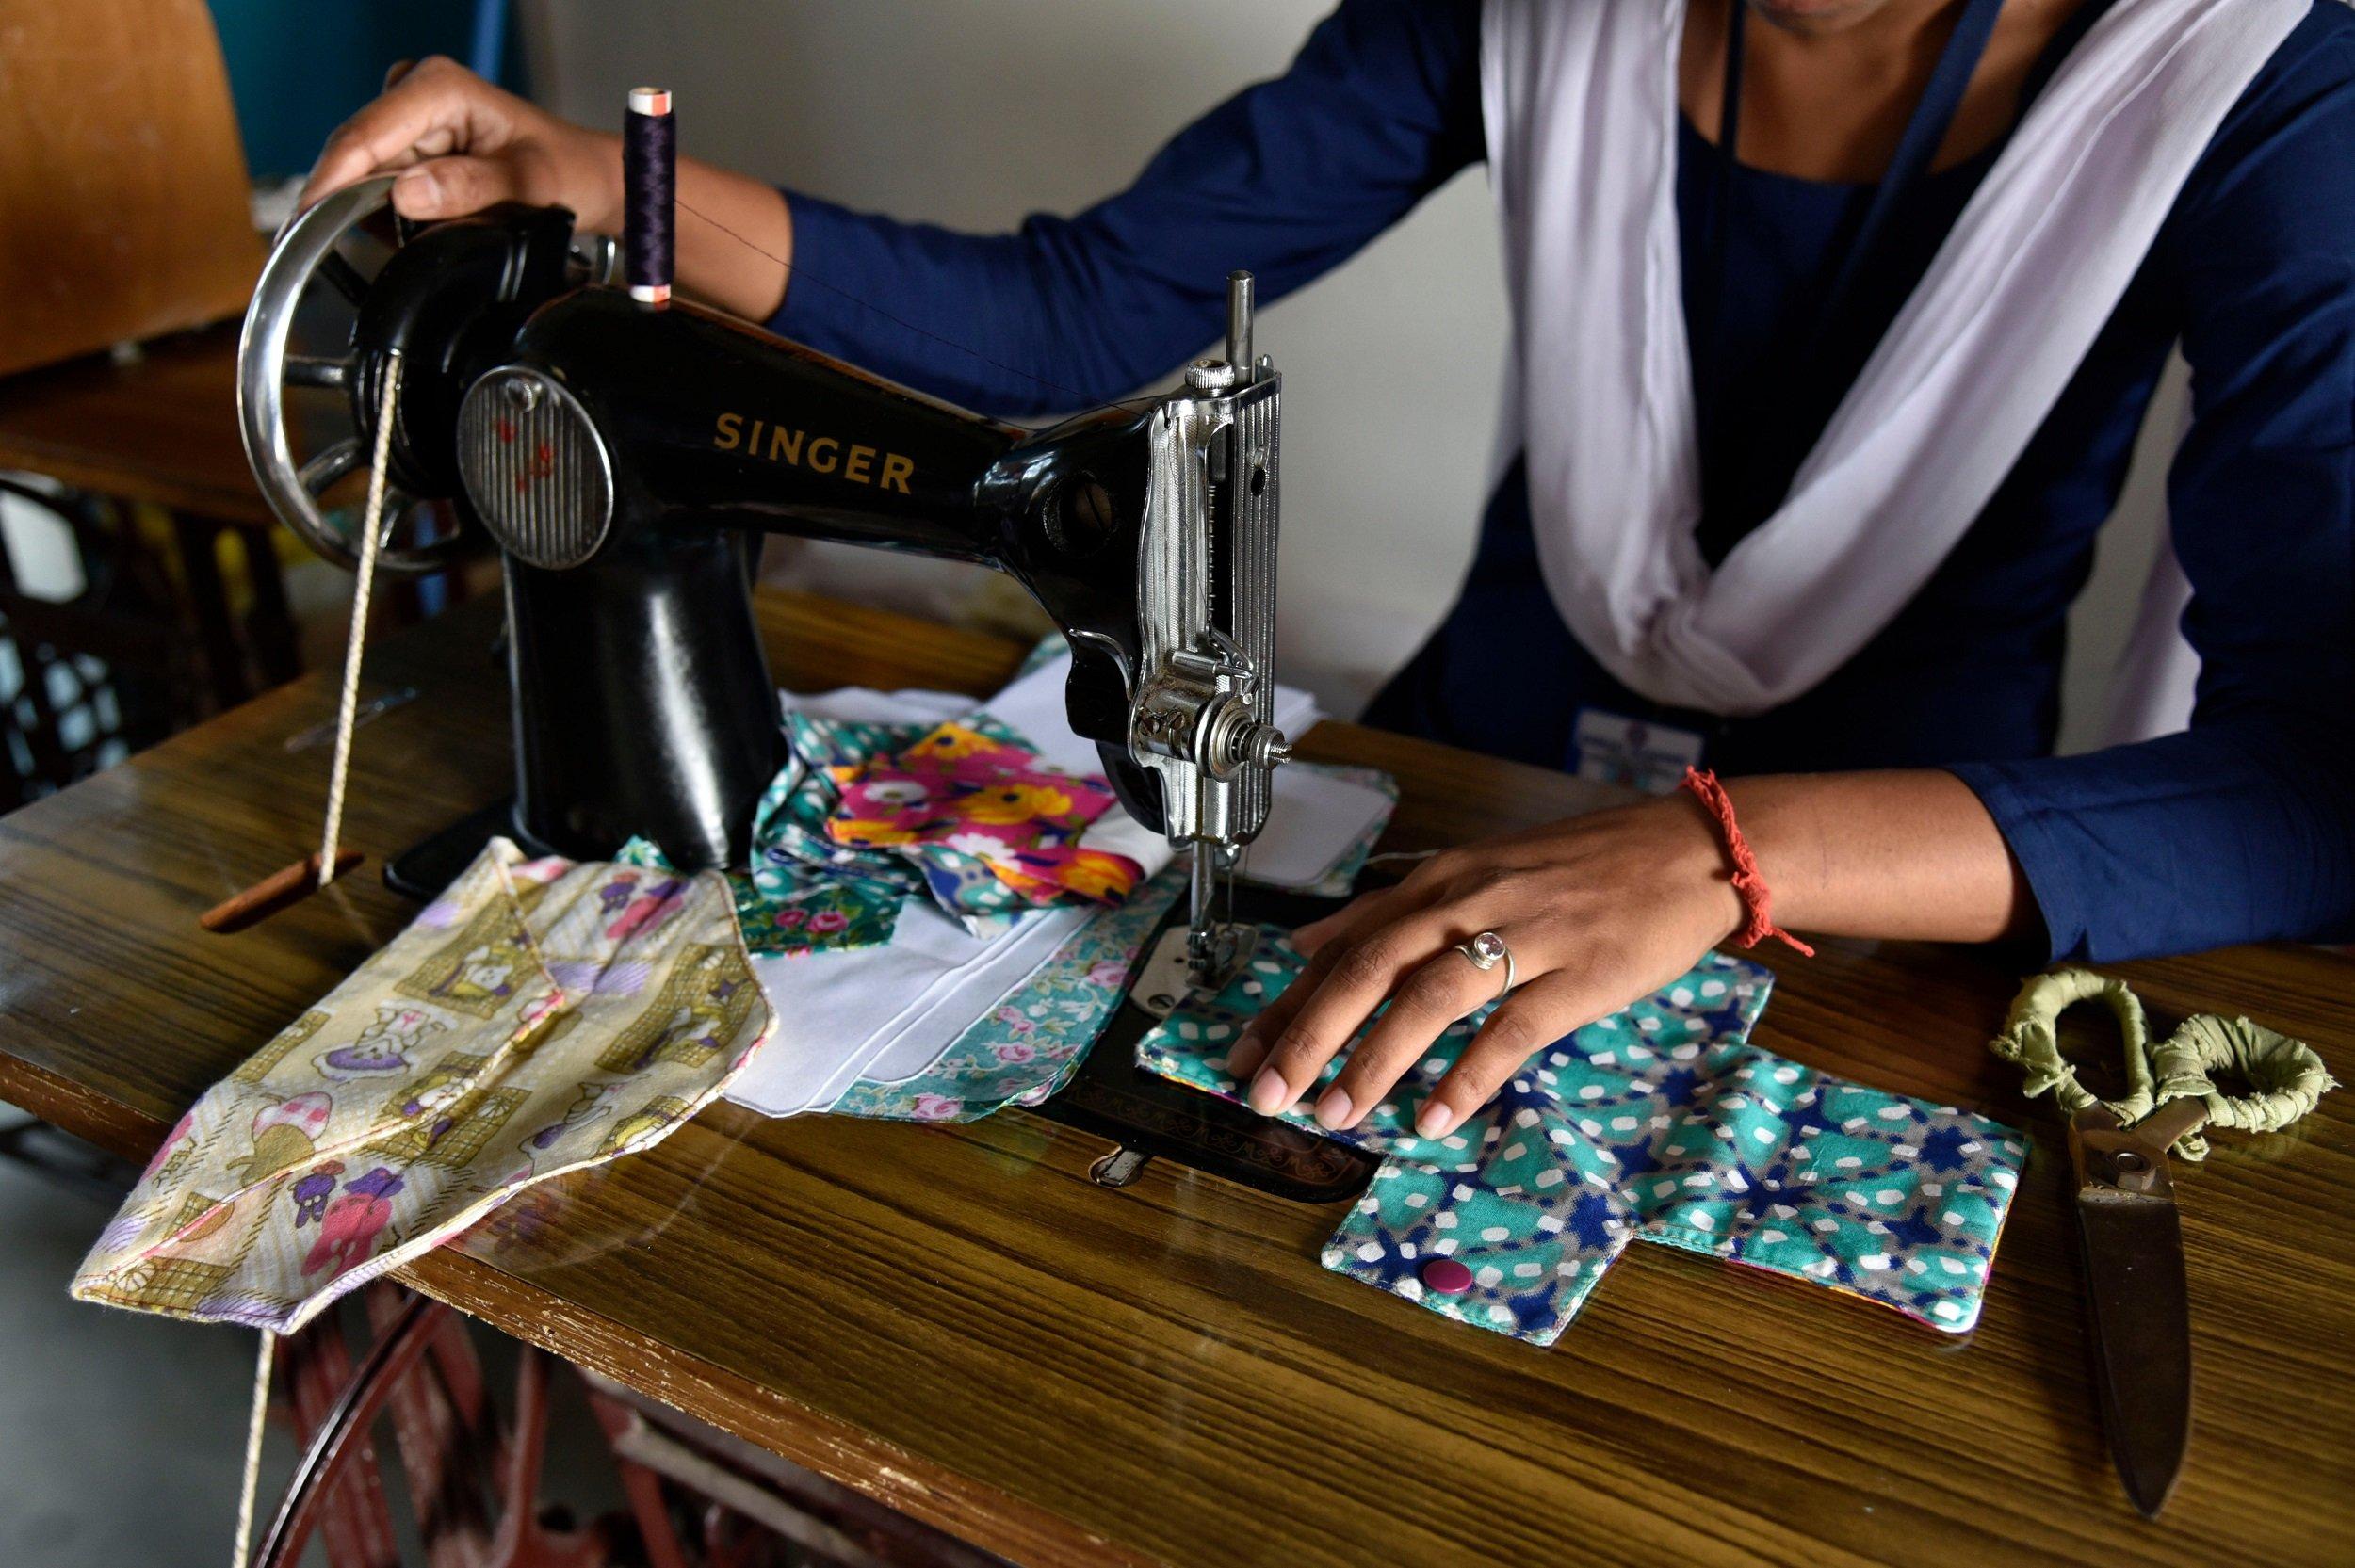 Students of Parijat Academy making reusable cloth menstrual pads [image by: David Talukdar / Alamy Live News]